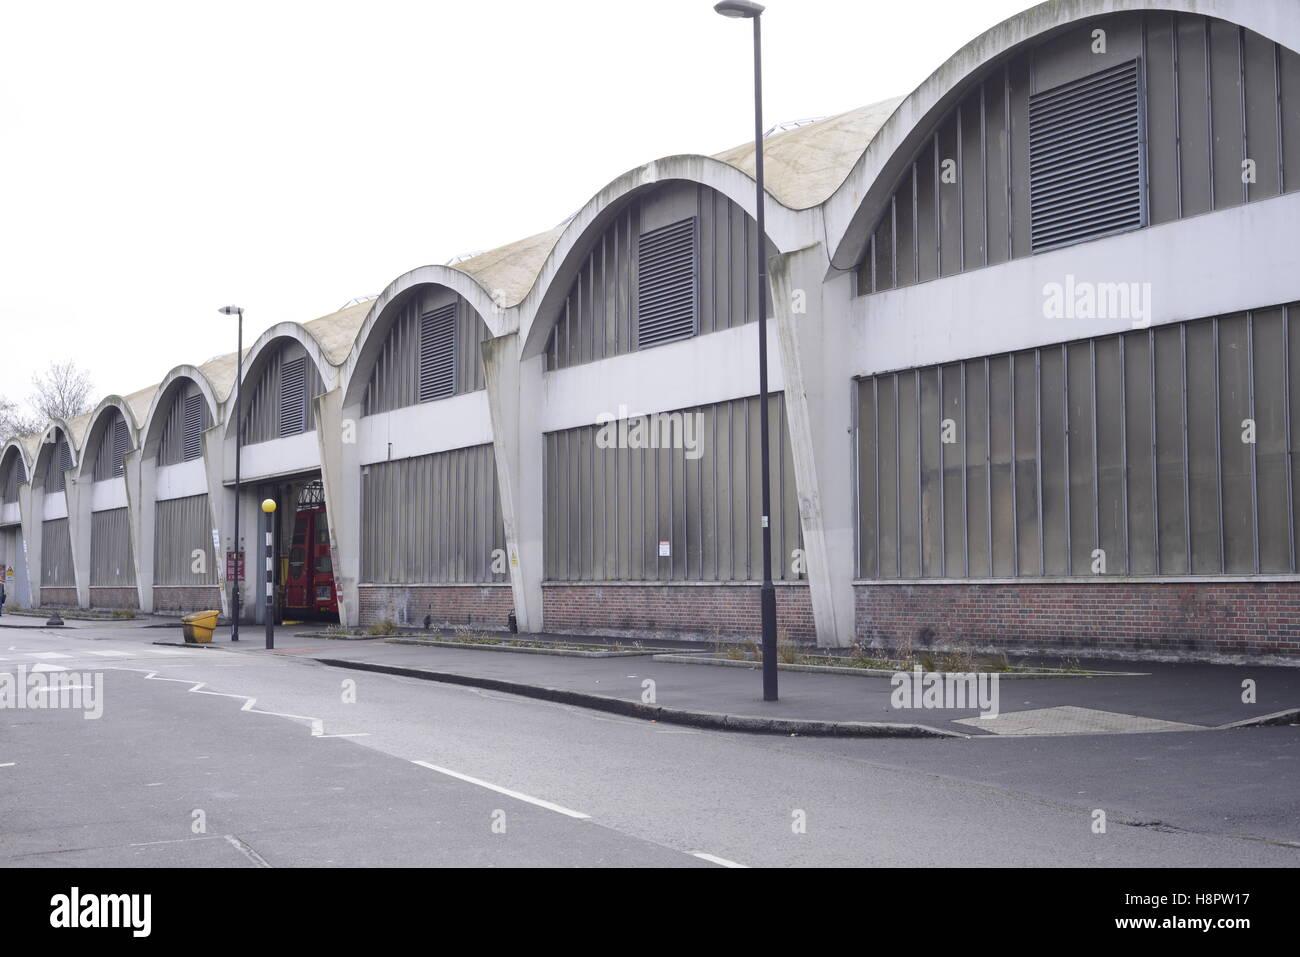 Bus depot in Stockwell, London UK - Stock Image